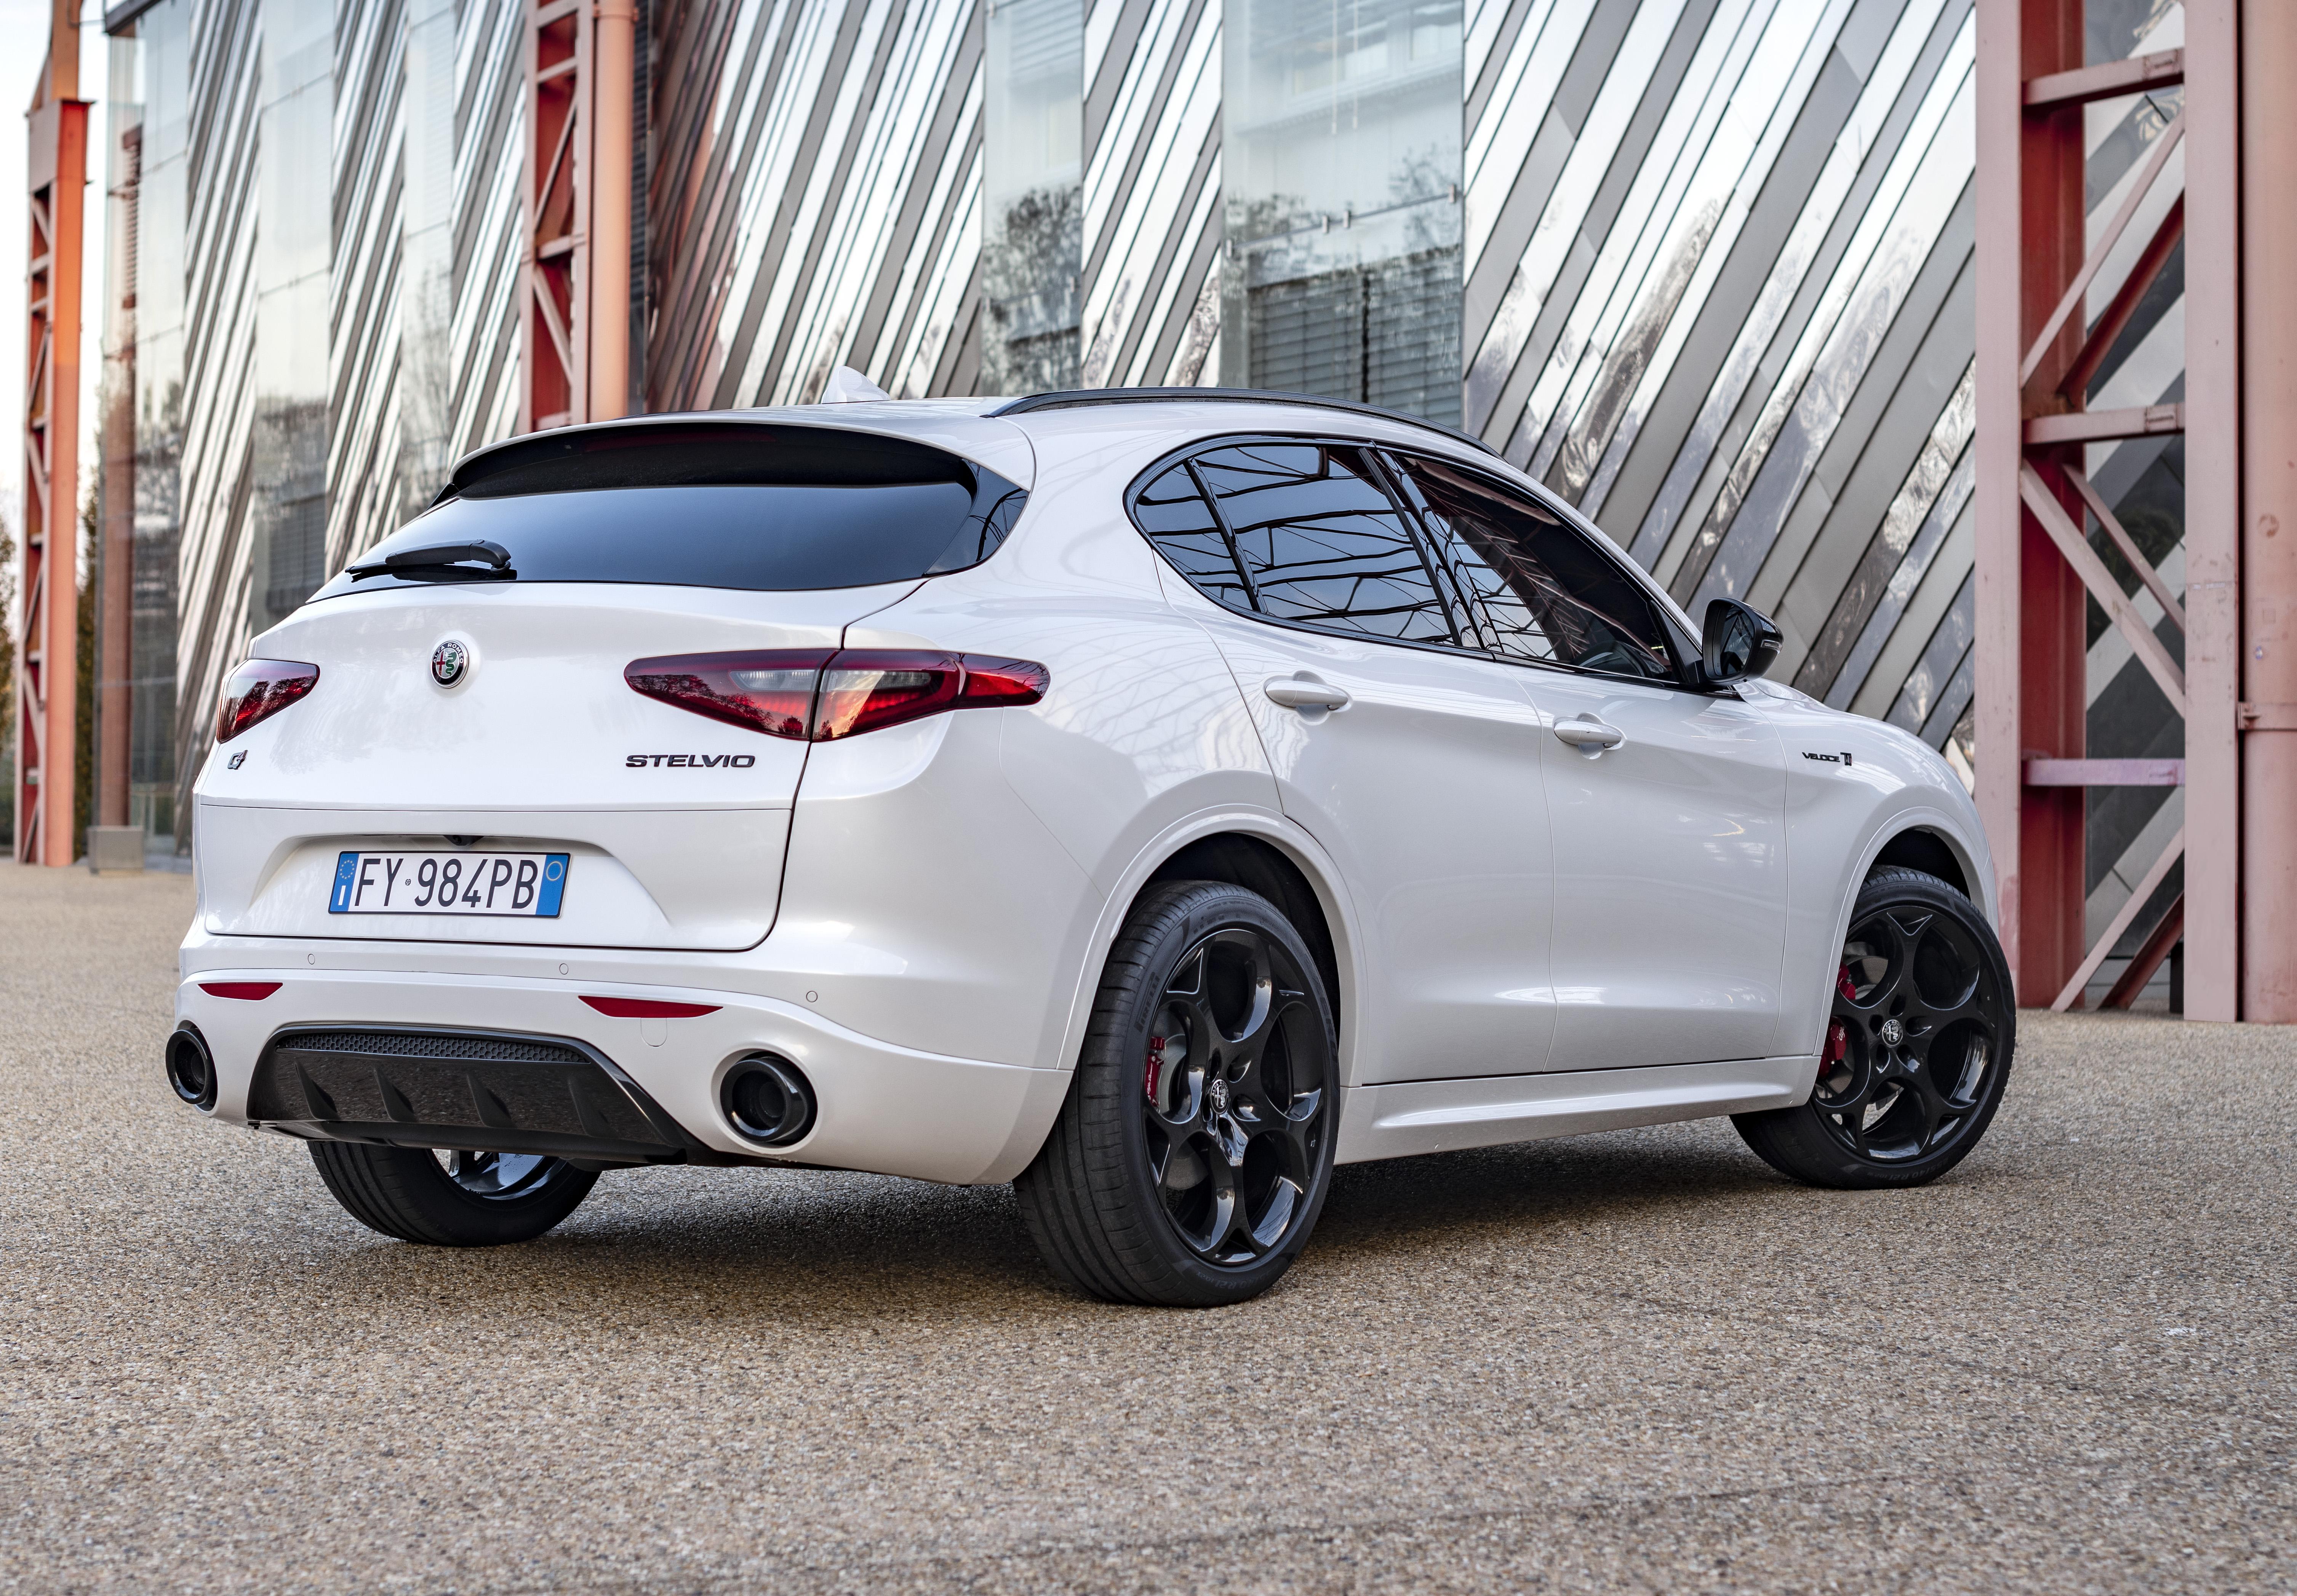 2021 Alfa Romeo Stelvio Veloce Ti Flaunts Carbon Fiber Driveshaft Turbo Power Autoevolution